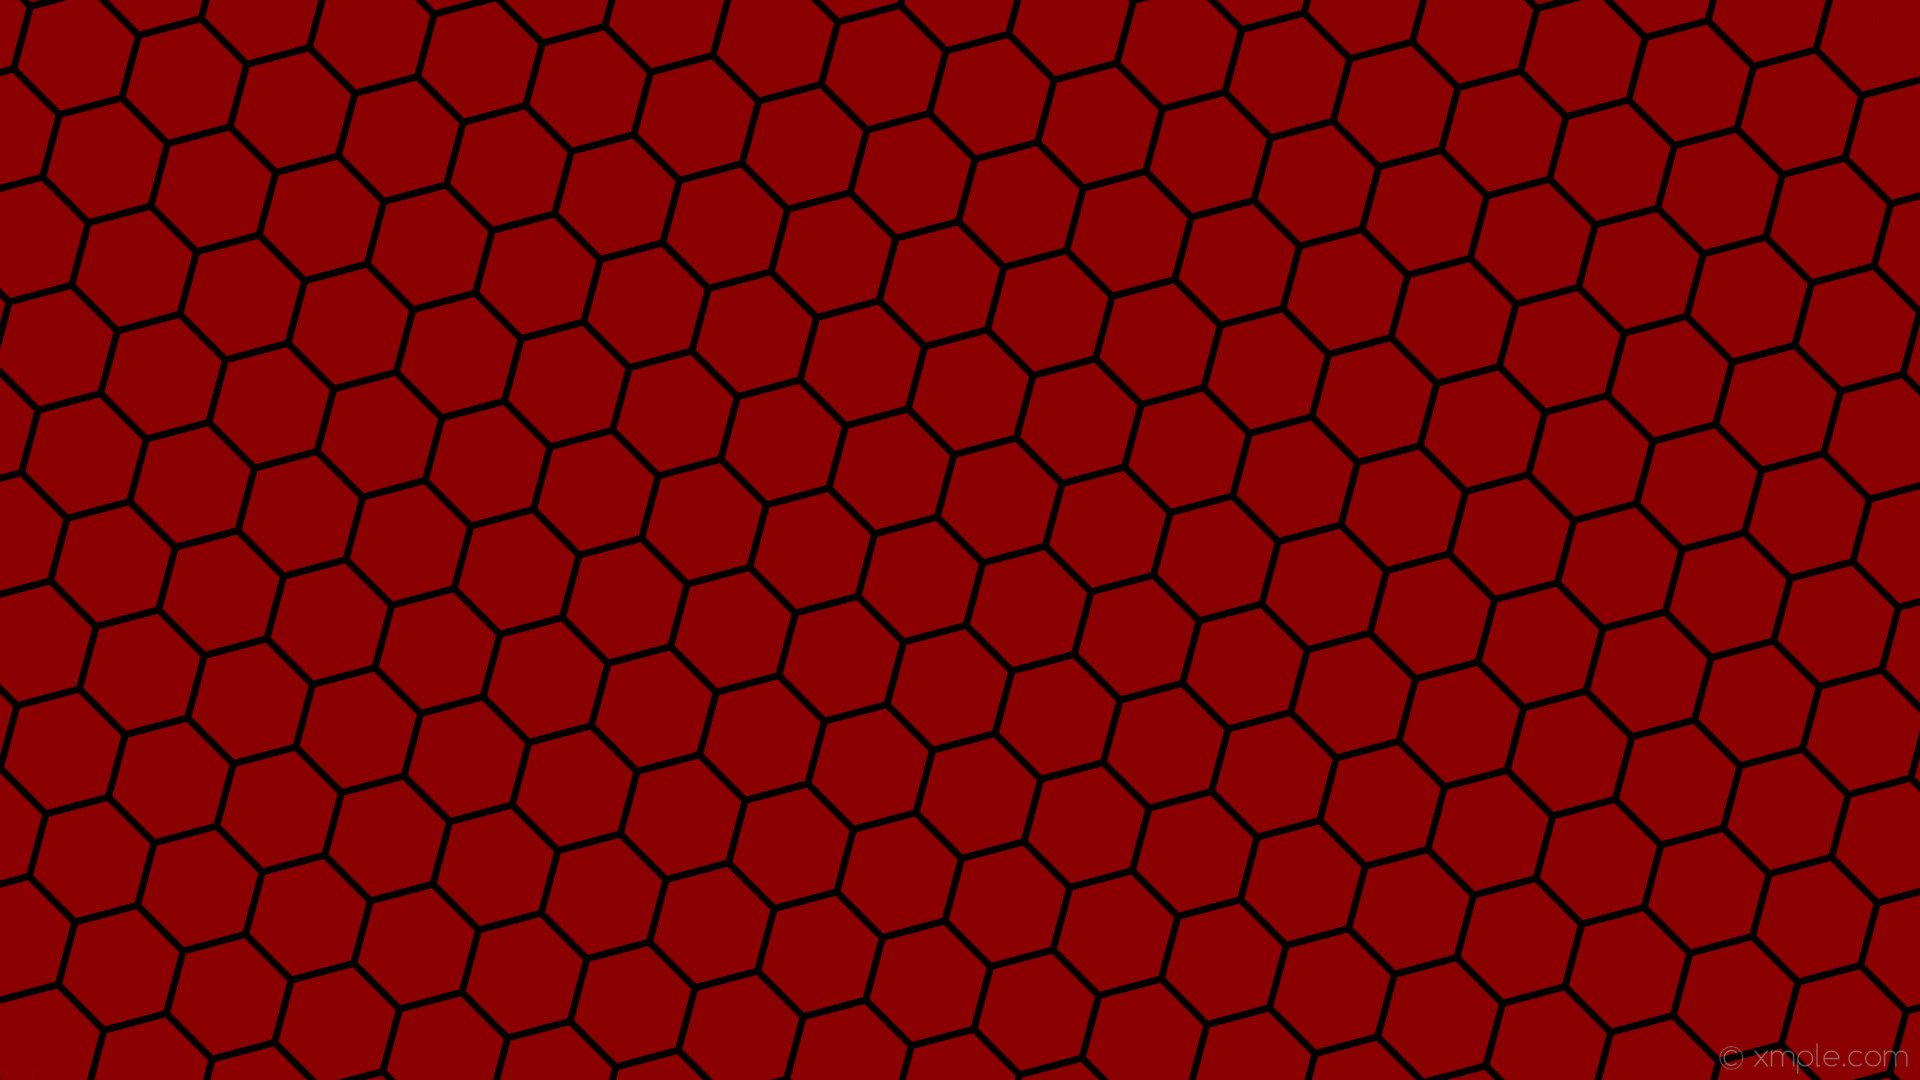 wallpaper beehive red black honeycomb hexagon dark red #8b0000 #000000  diagonal 45° 7px